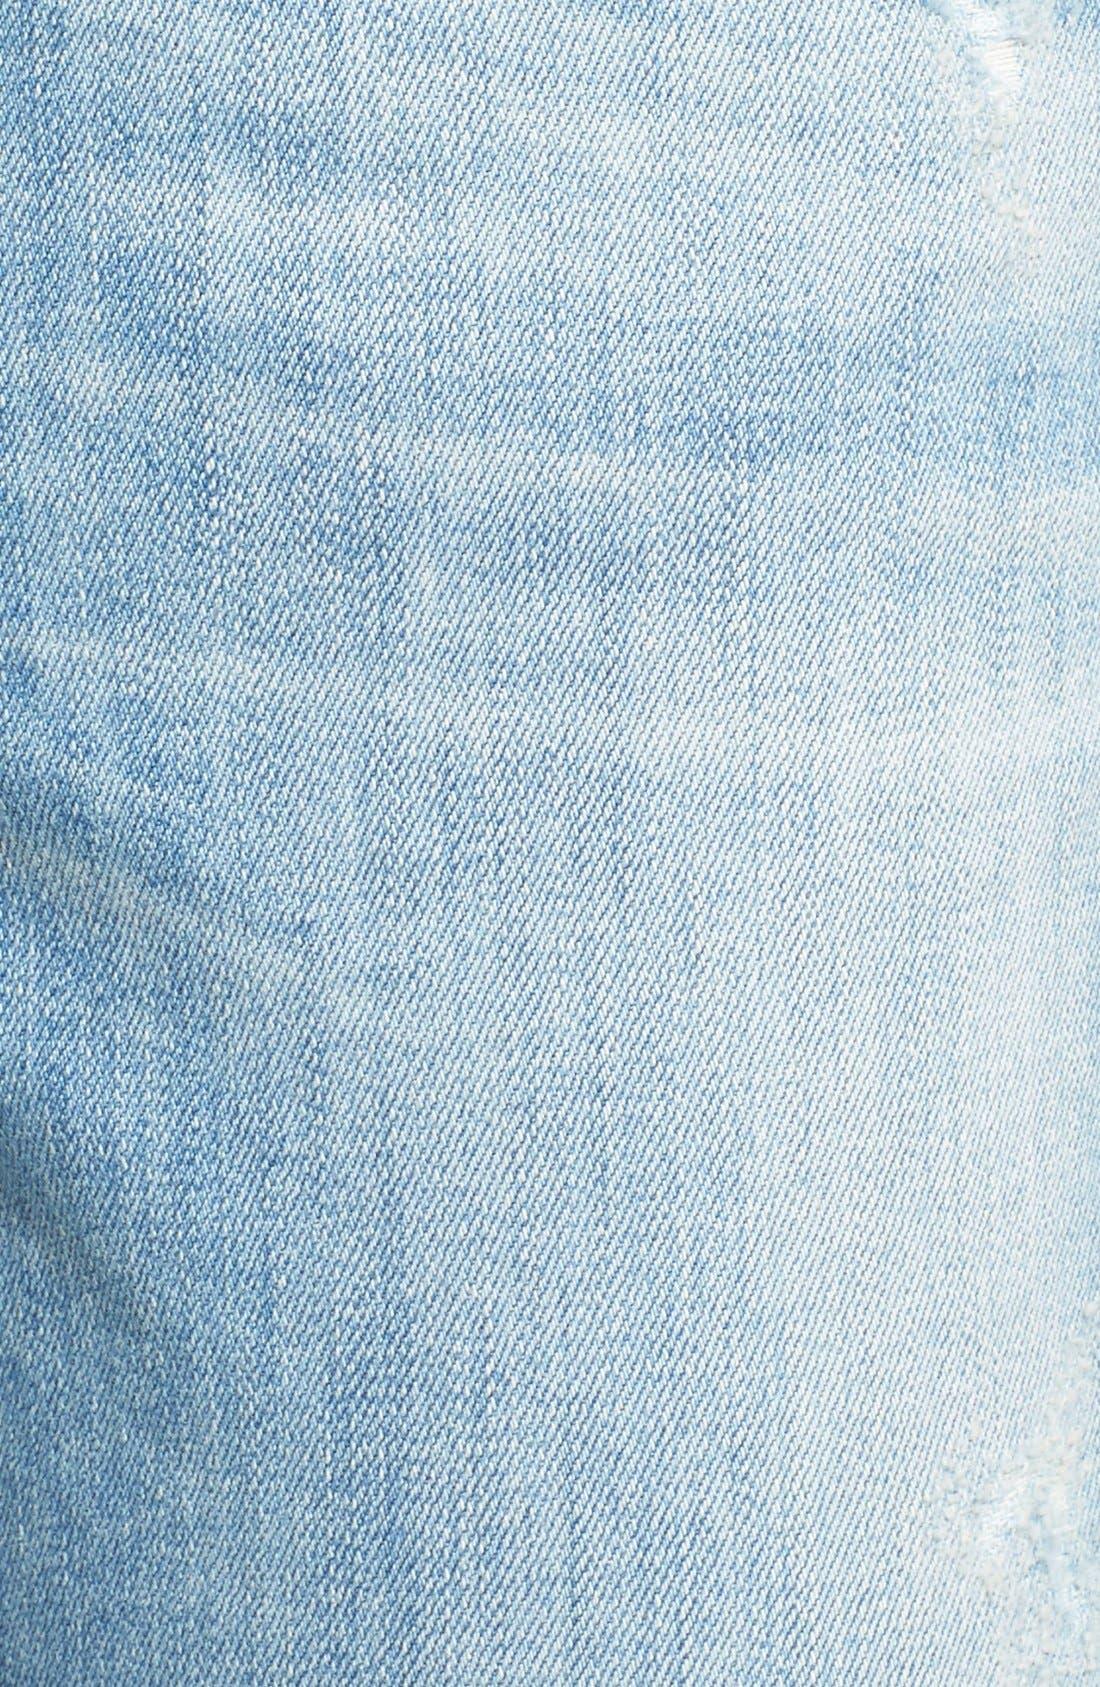 Alternate Image 5  - A Gold E 'Madison' Ultra Flare Jeans (Blue Lagoon)